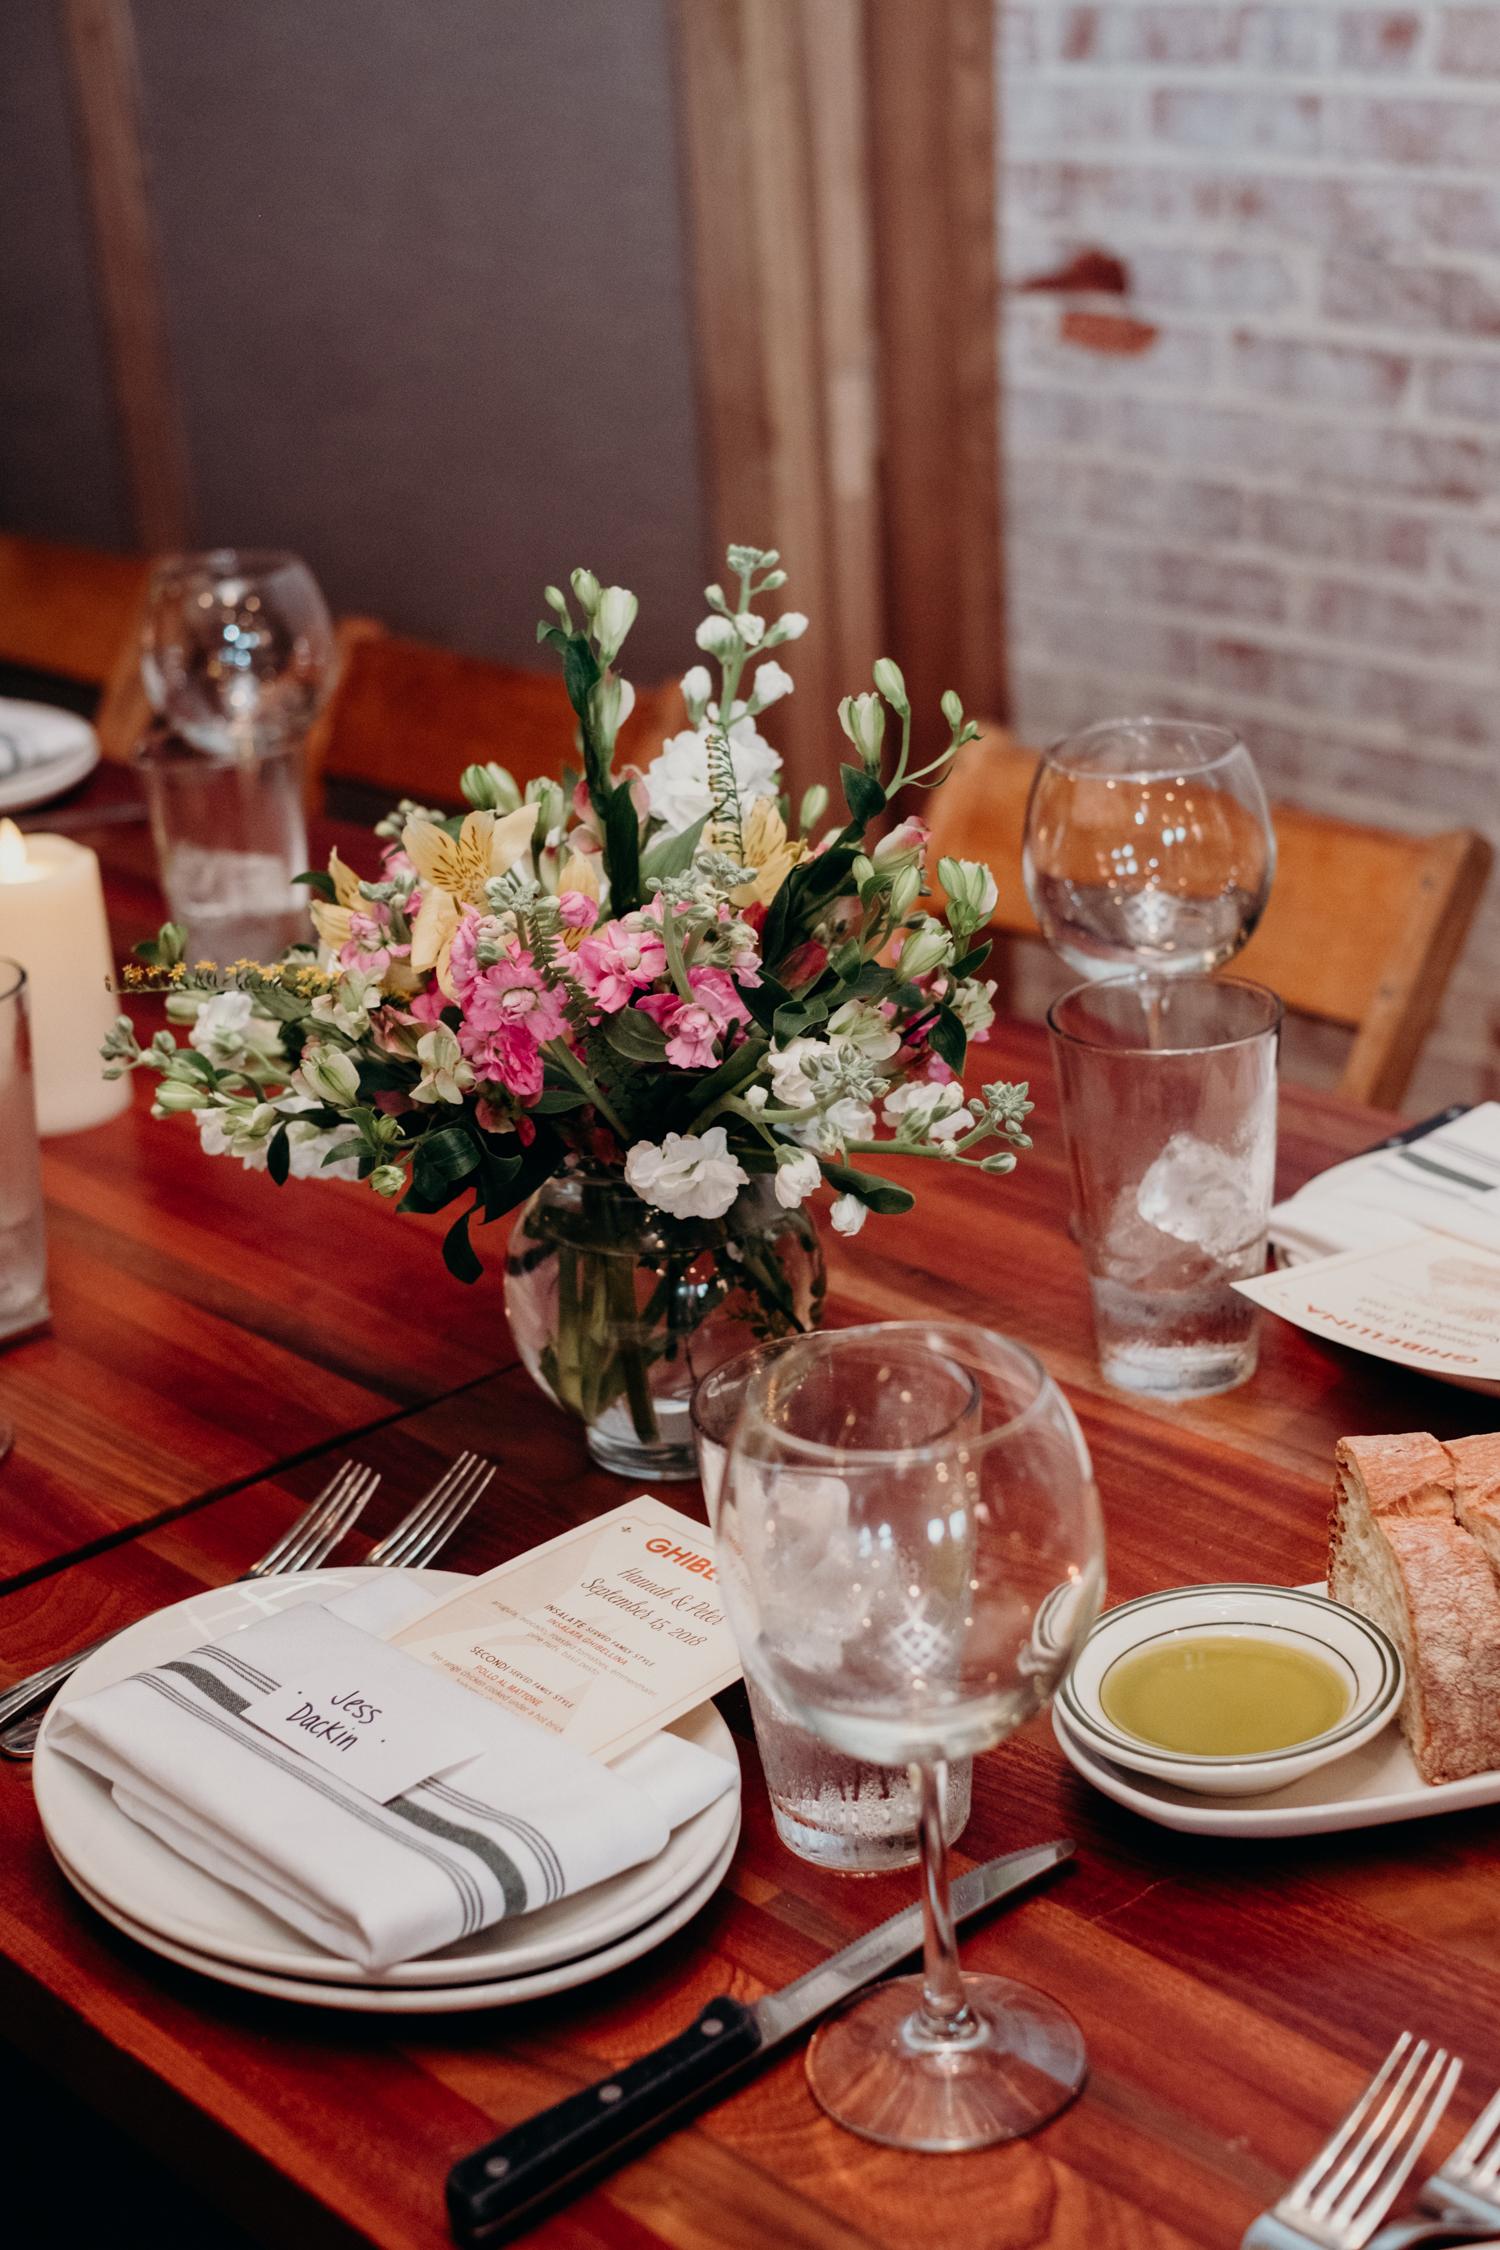 Ghibellina dc restaurant wedding reception table setting